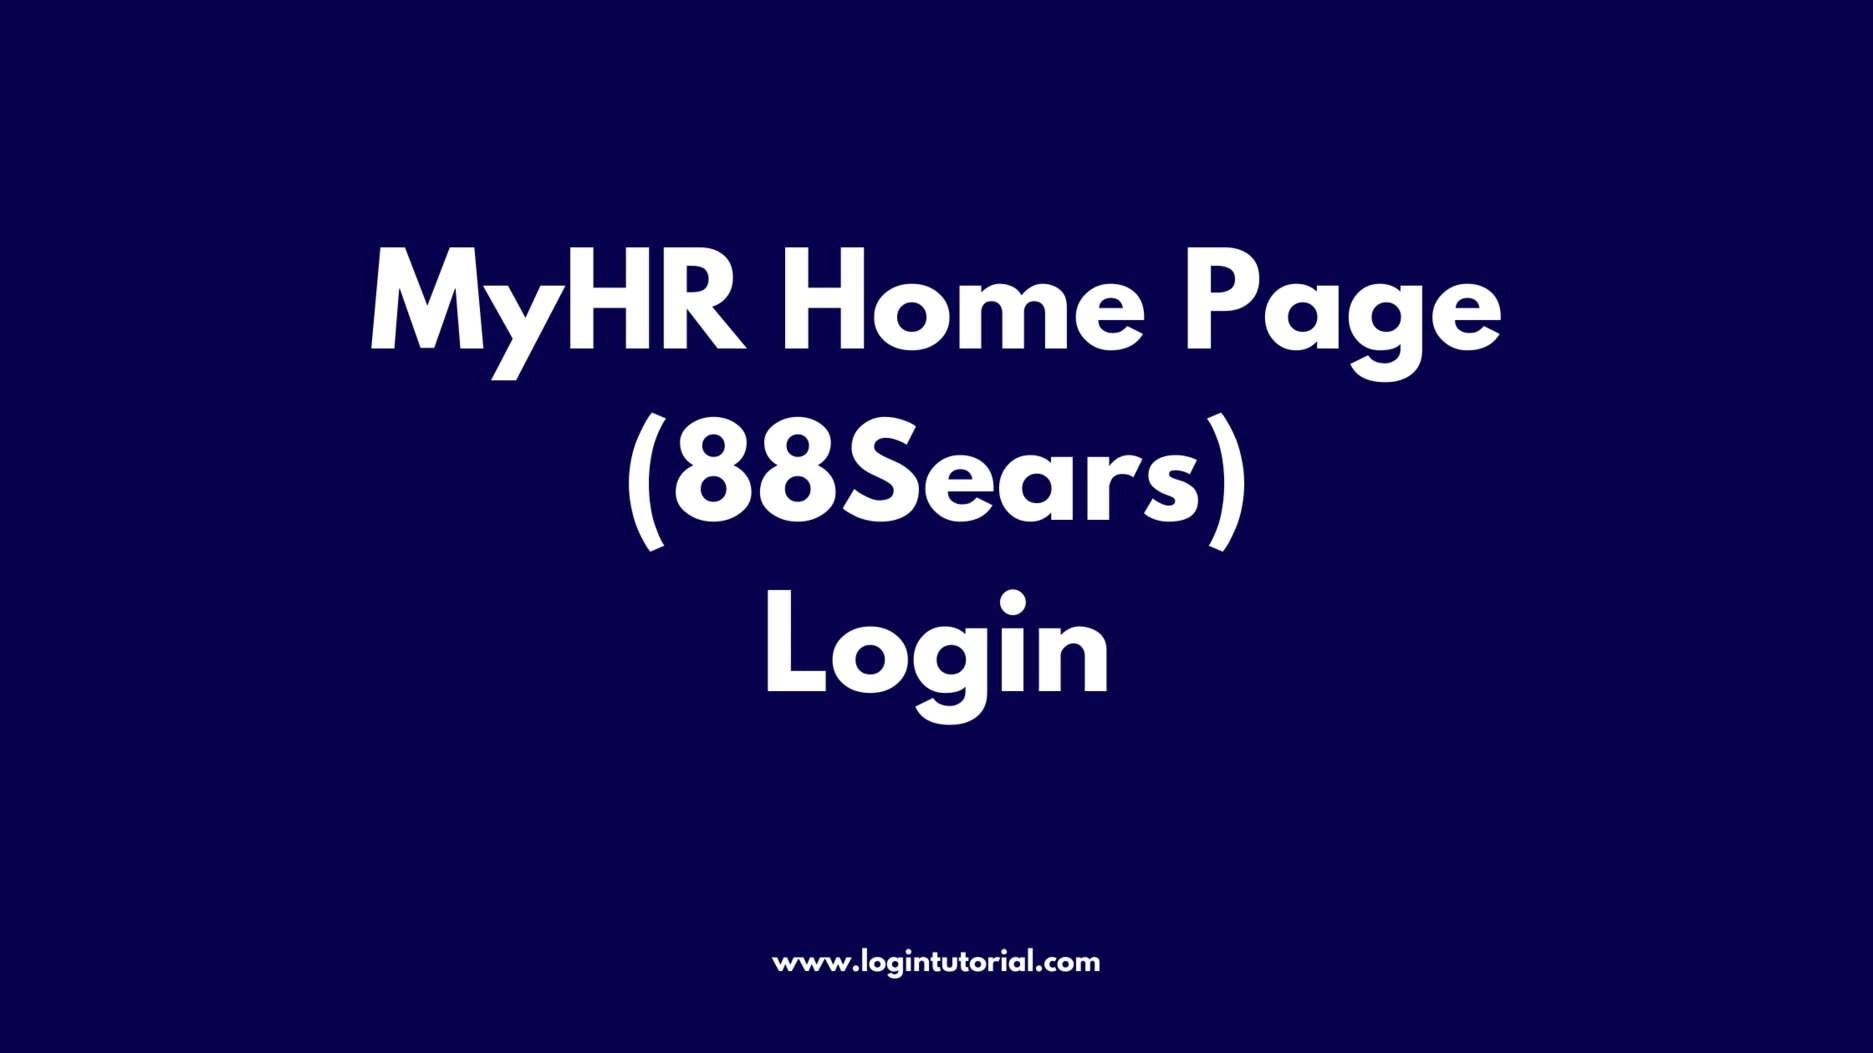 MyHR Home Page 88Sears Login